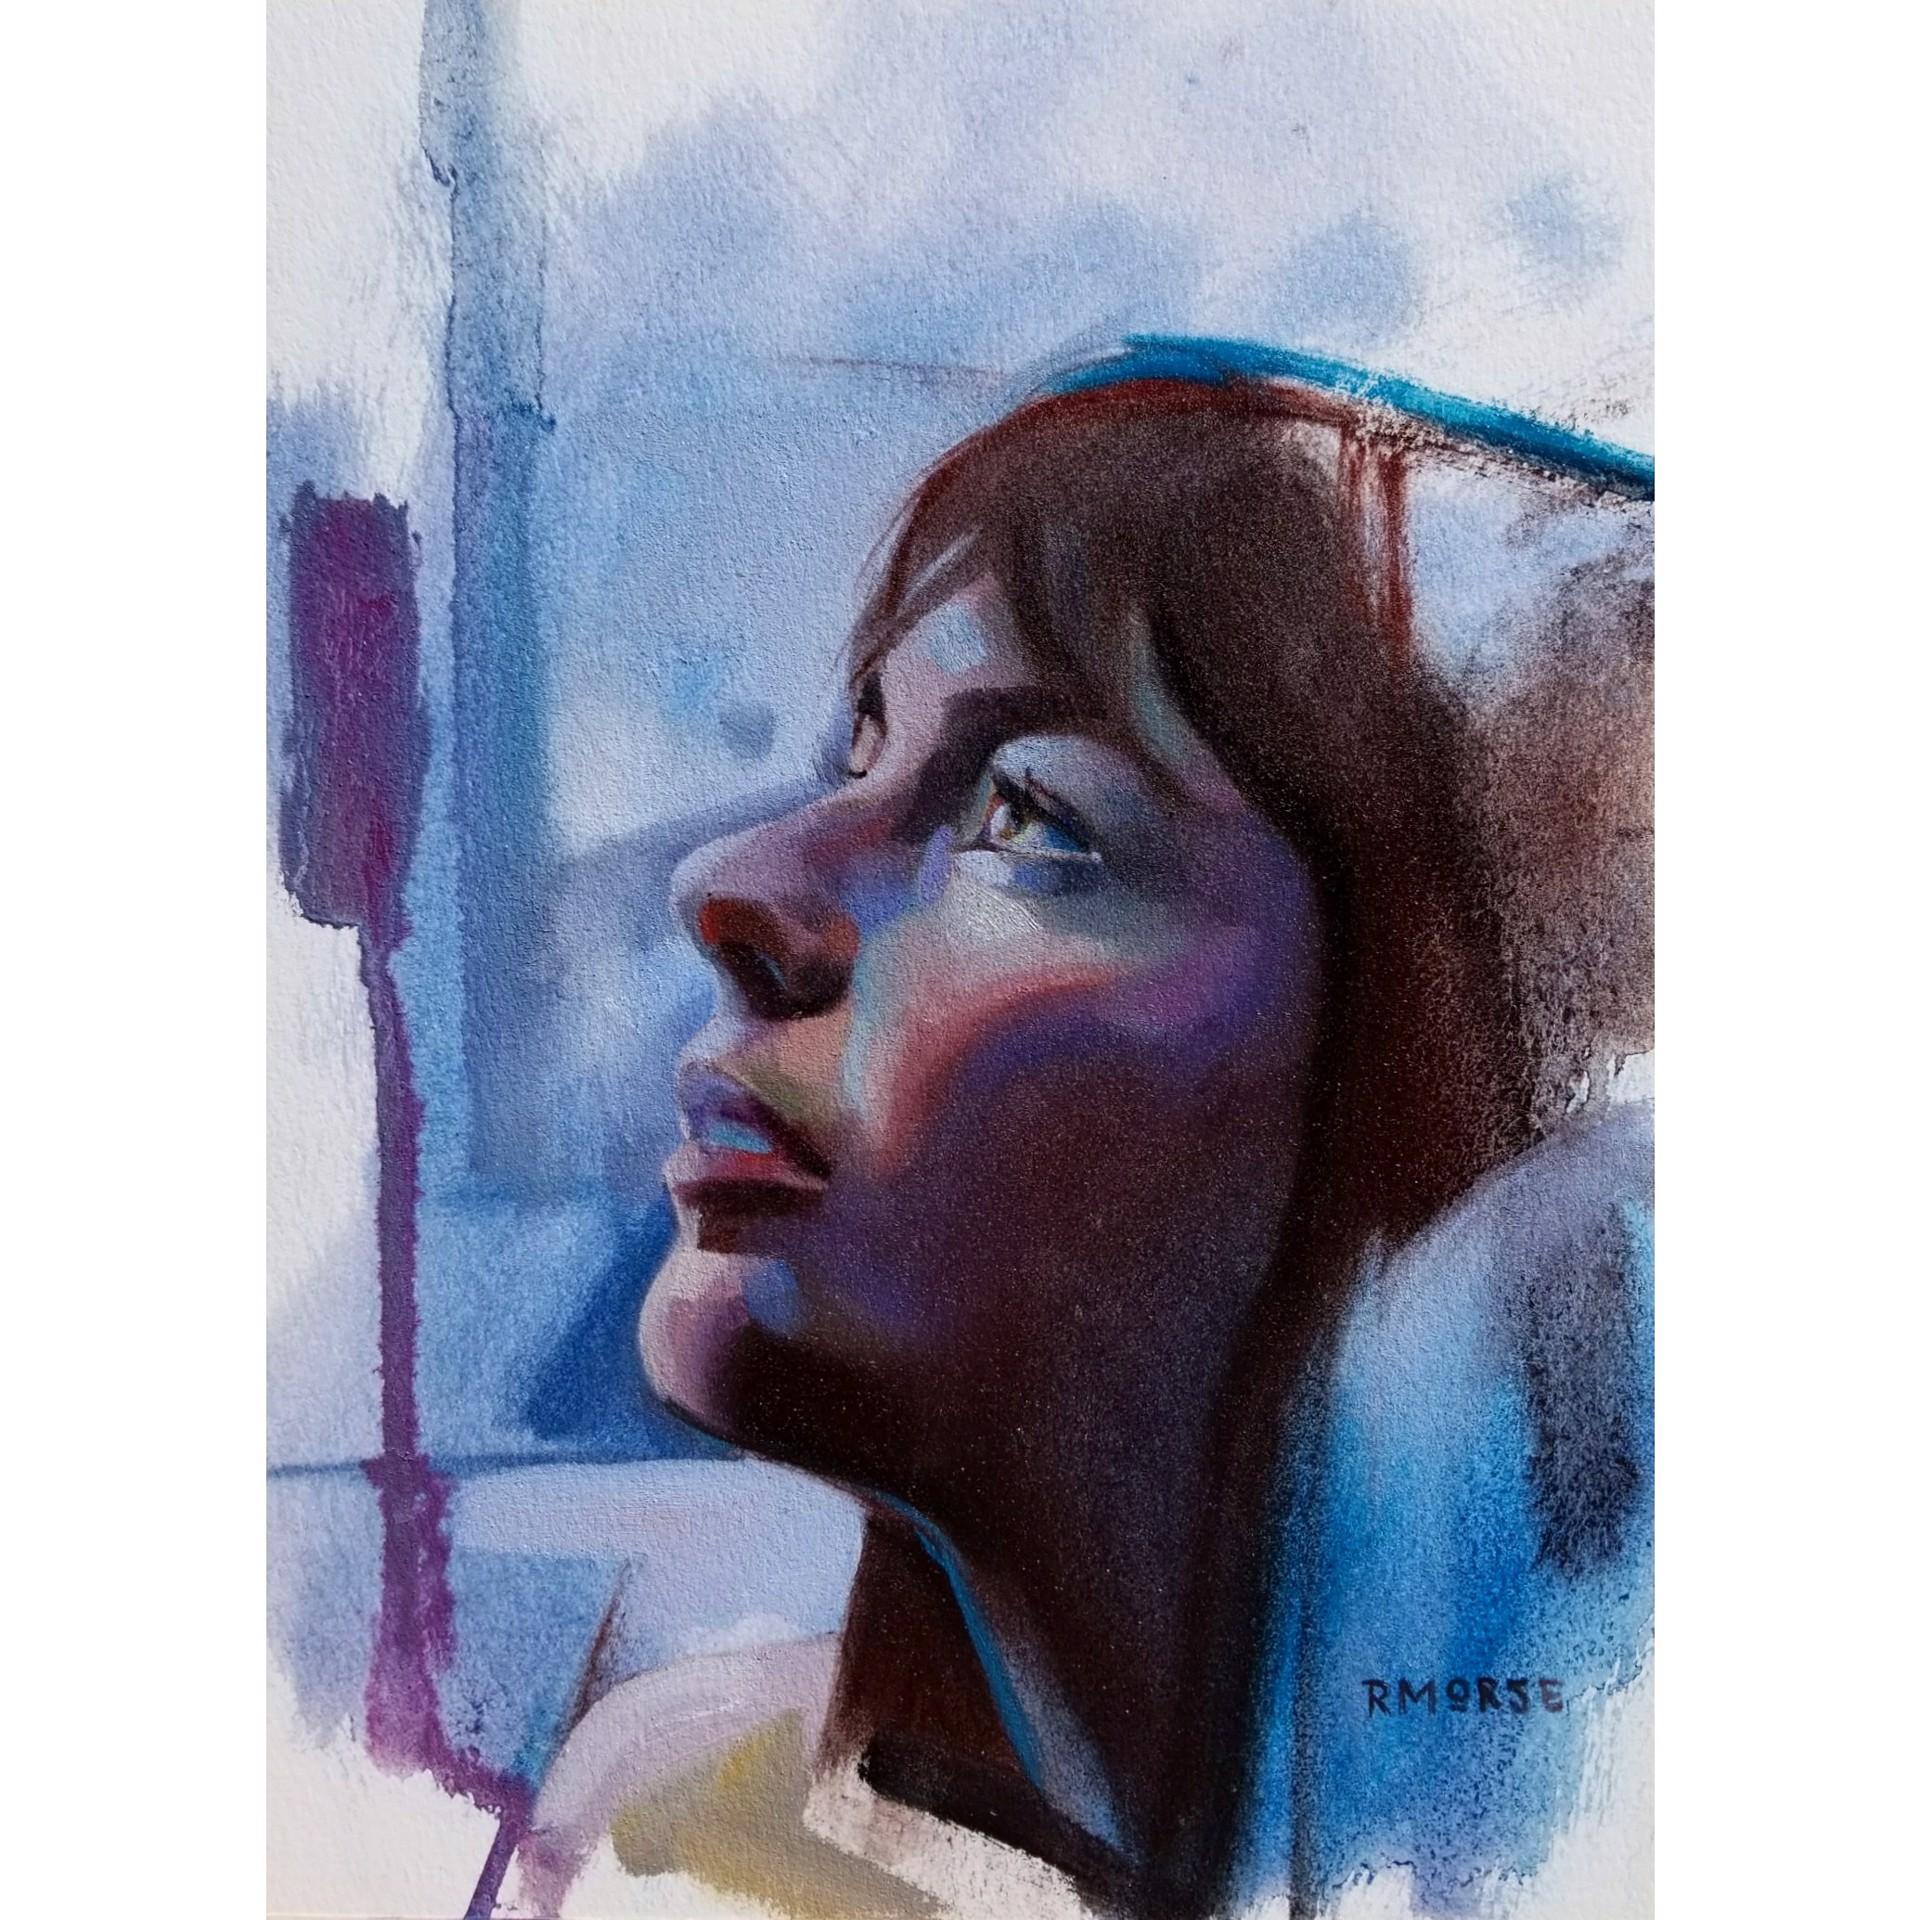 Silence by Ryan Morse